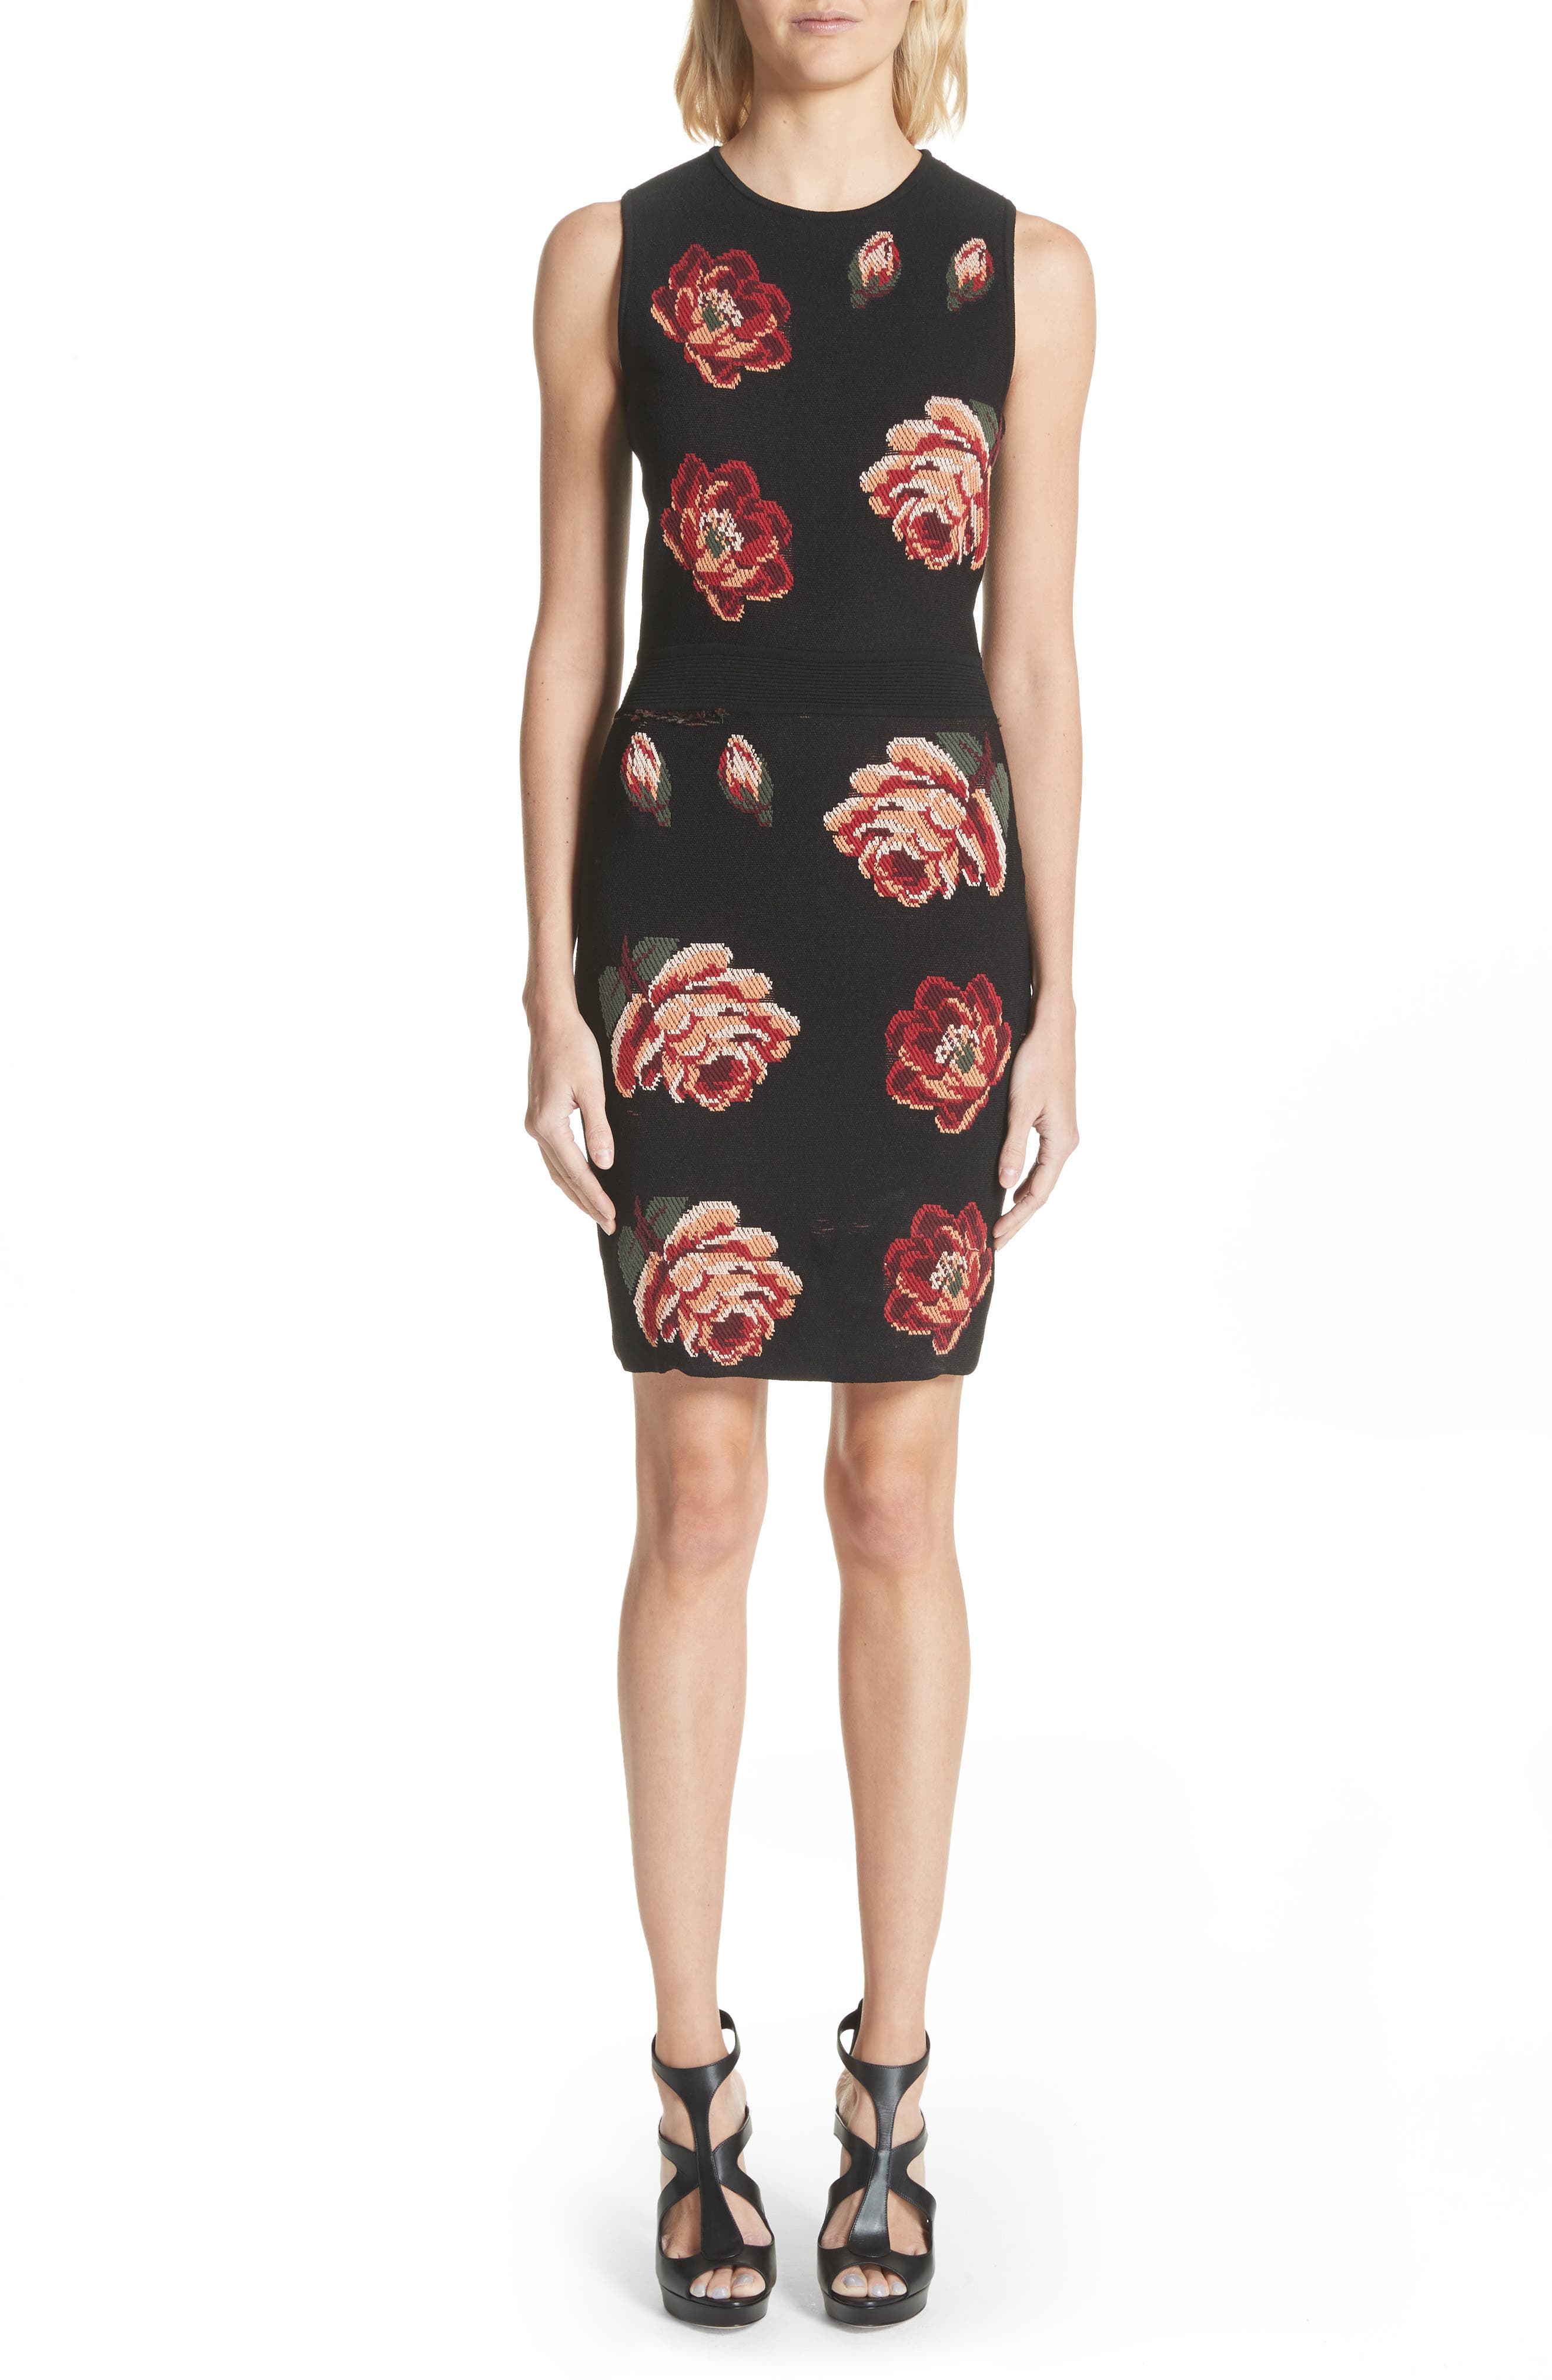 Intarsia Floral Print Dress,                         Main,                         color, Black/ Red/ Green